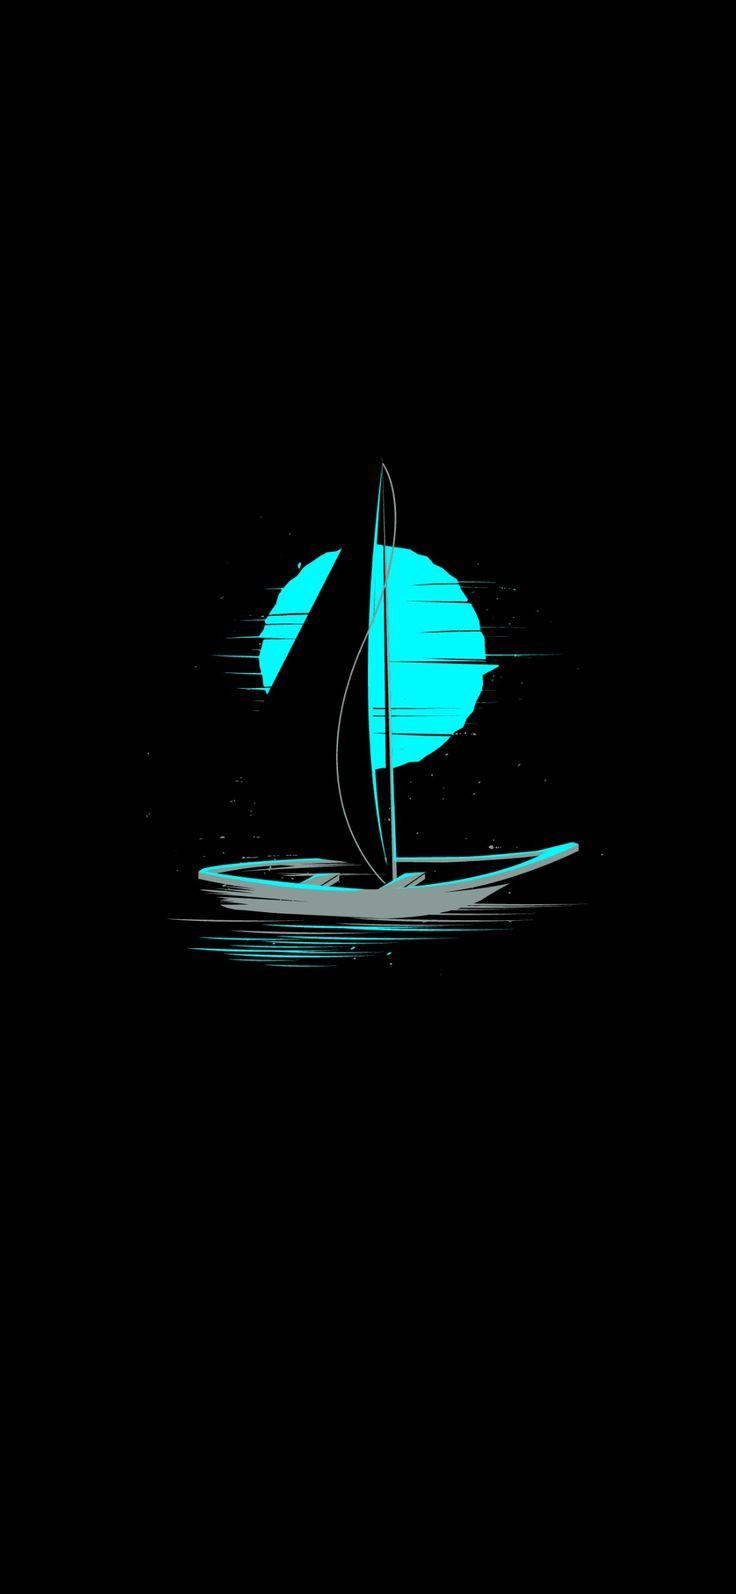 Bulan Biru dan Perahu Layar Wallpaper Phone